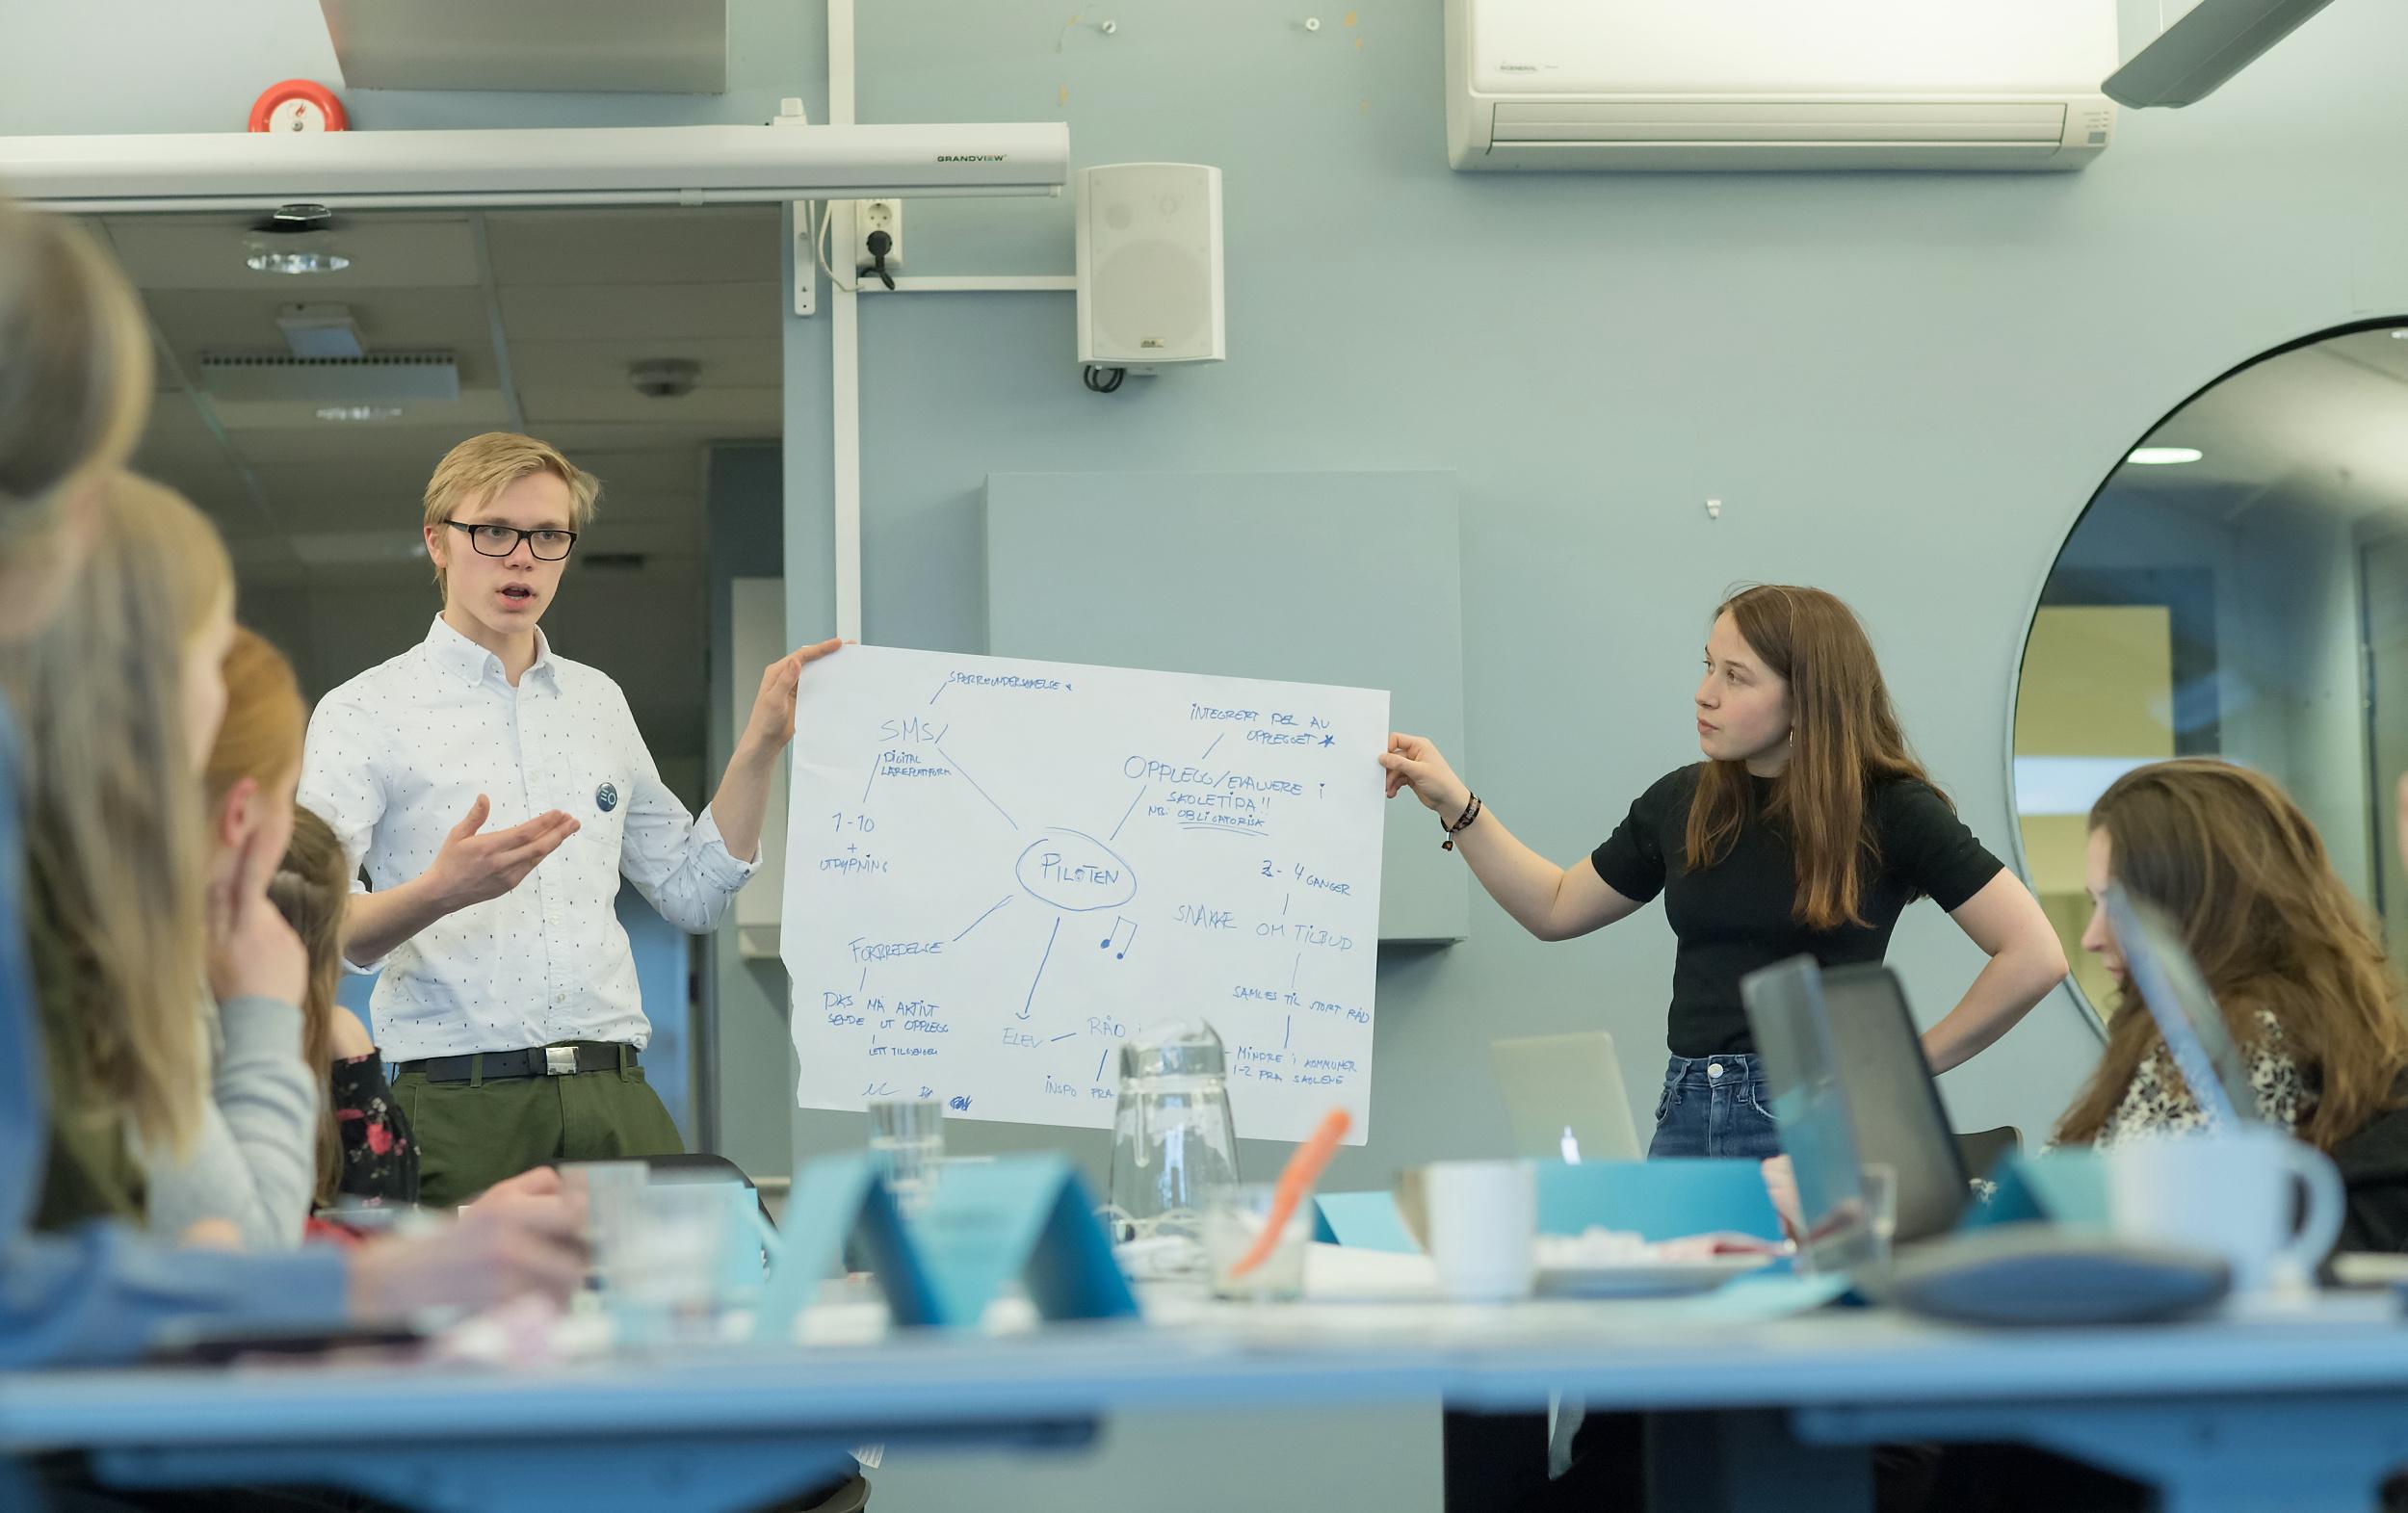 Kulturtankens ungdomsråd legger planer for pilotprosjekt om elevmedvirkning i DKS.